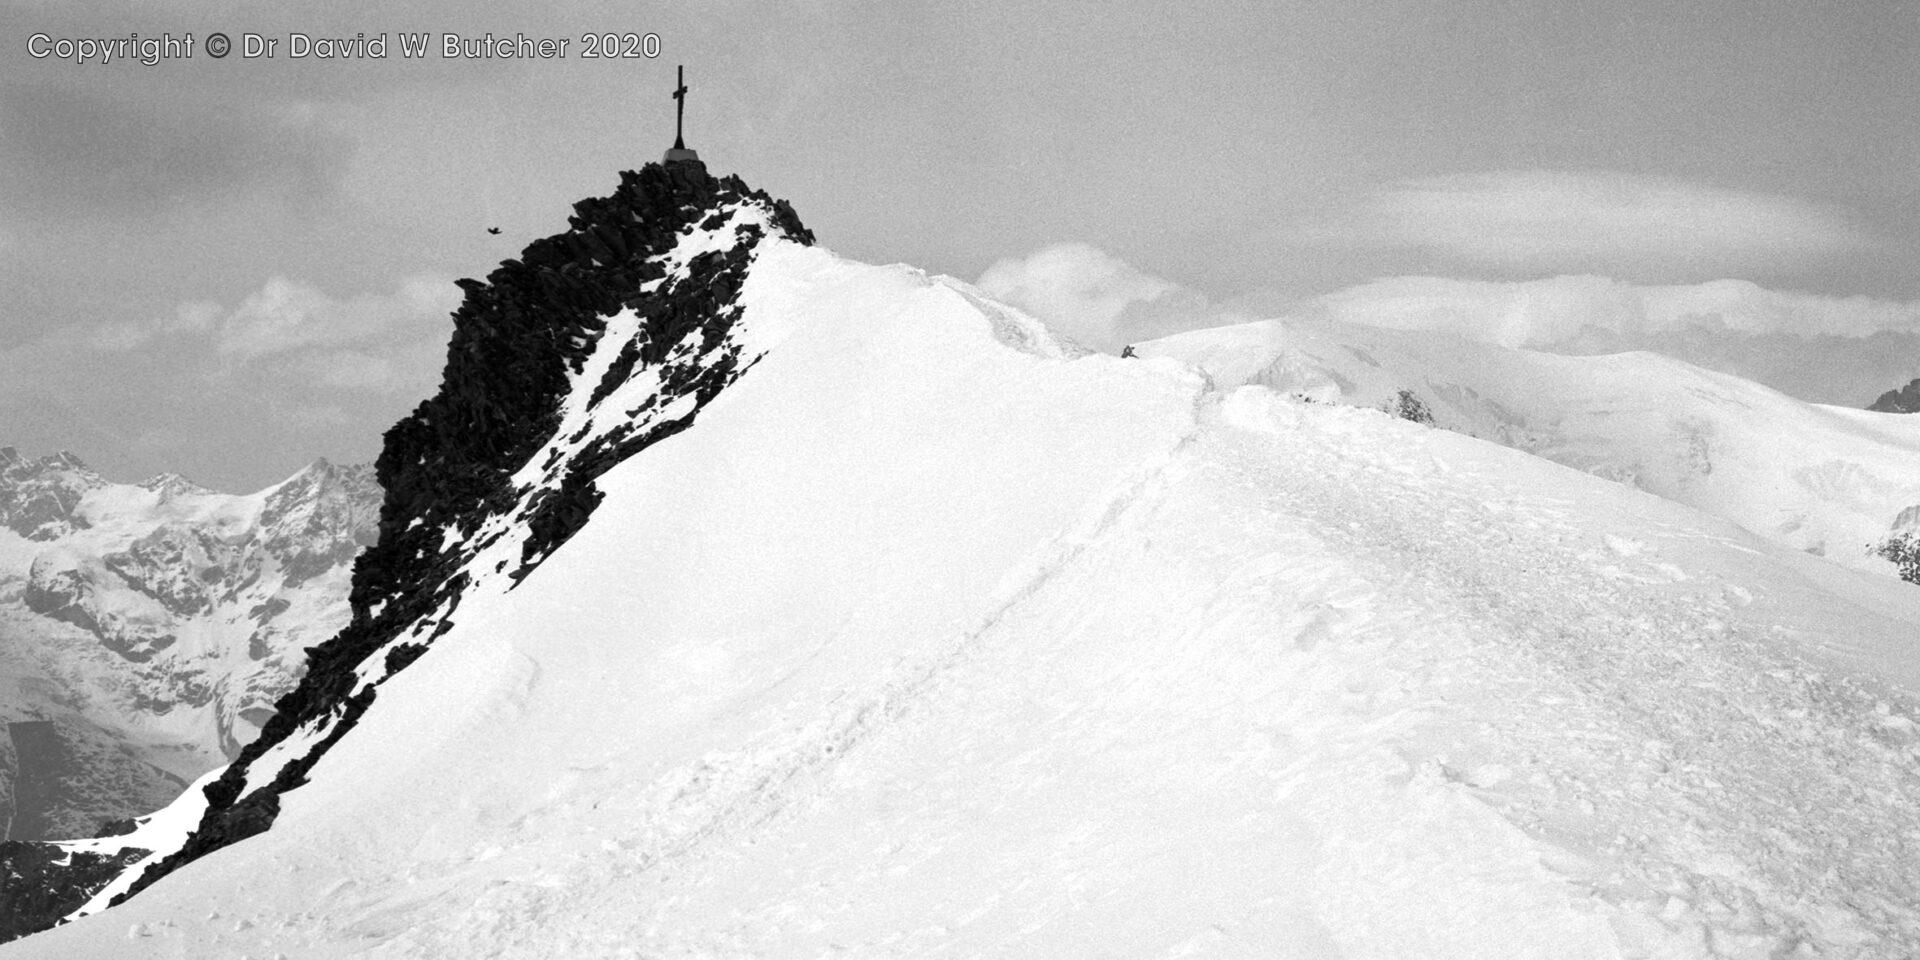 Saas Fee, Allalinhorn Summit, Switzerland